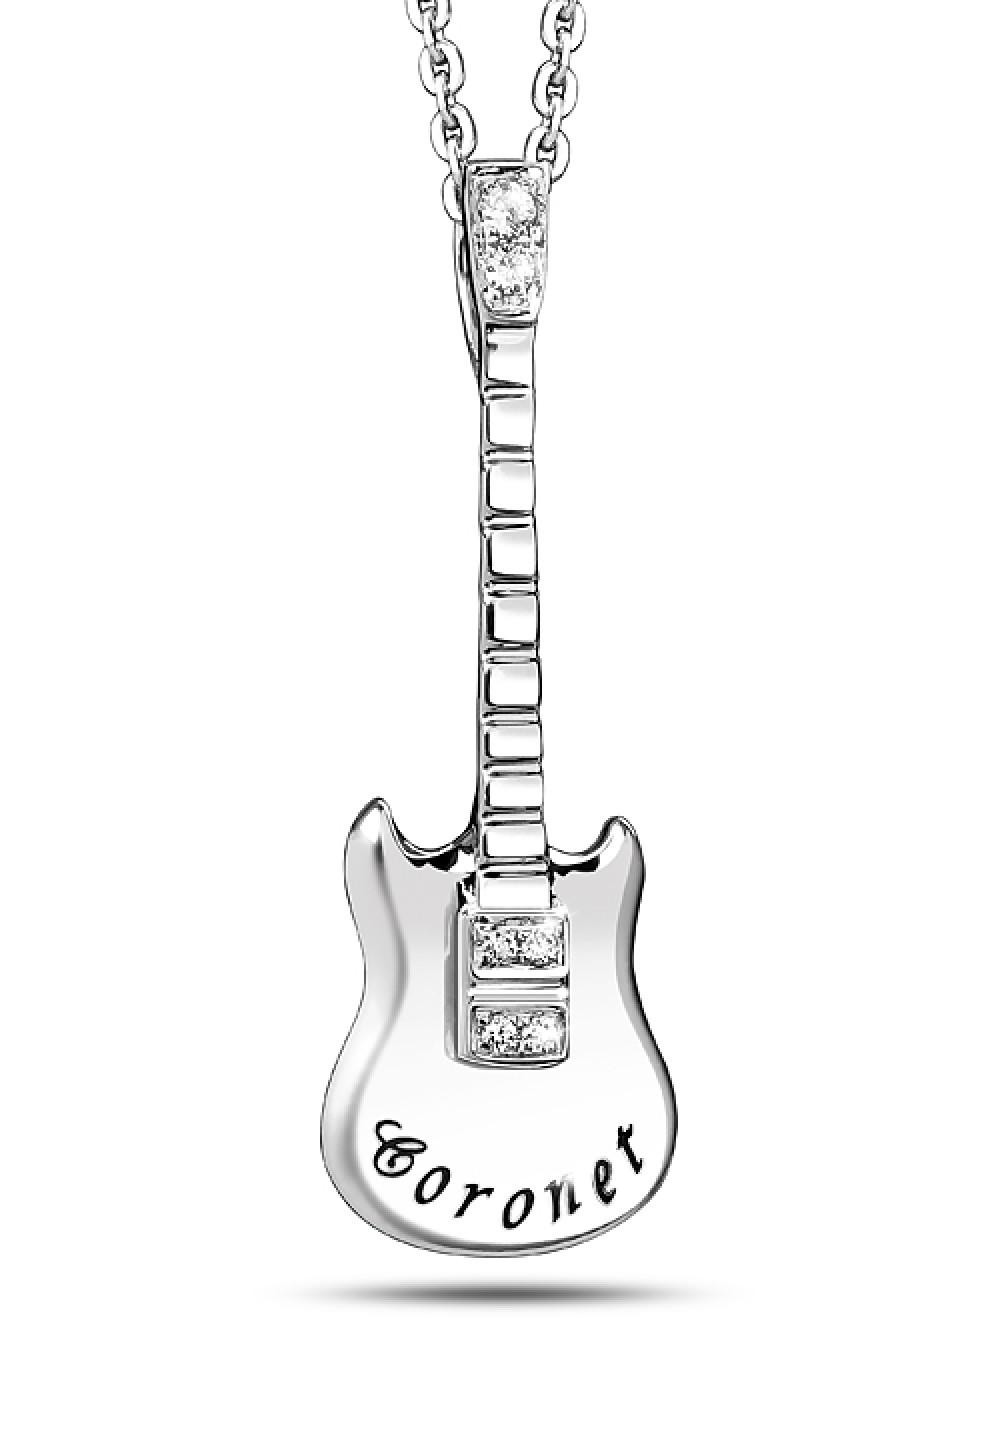 Buy online fashion jewelry accessories coronet store 18k white gold mini diamond guitar pendant aloadofball Choice Image